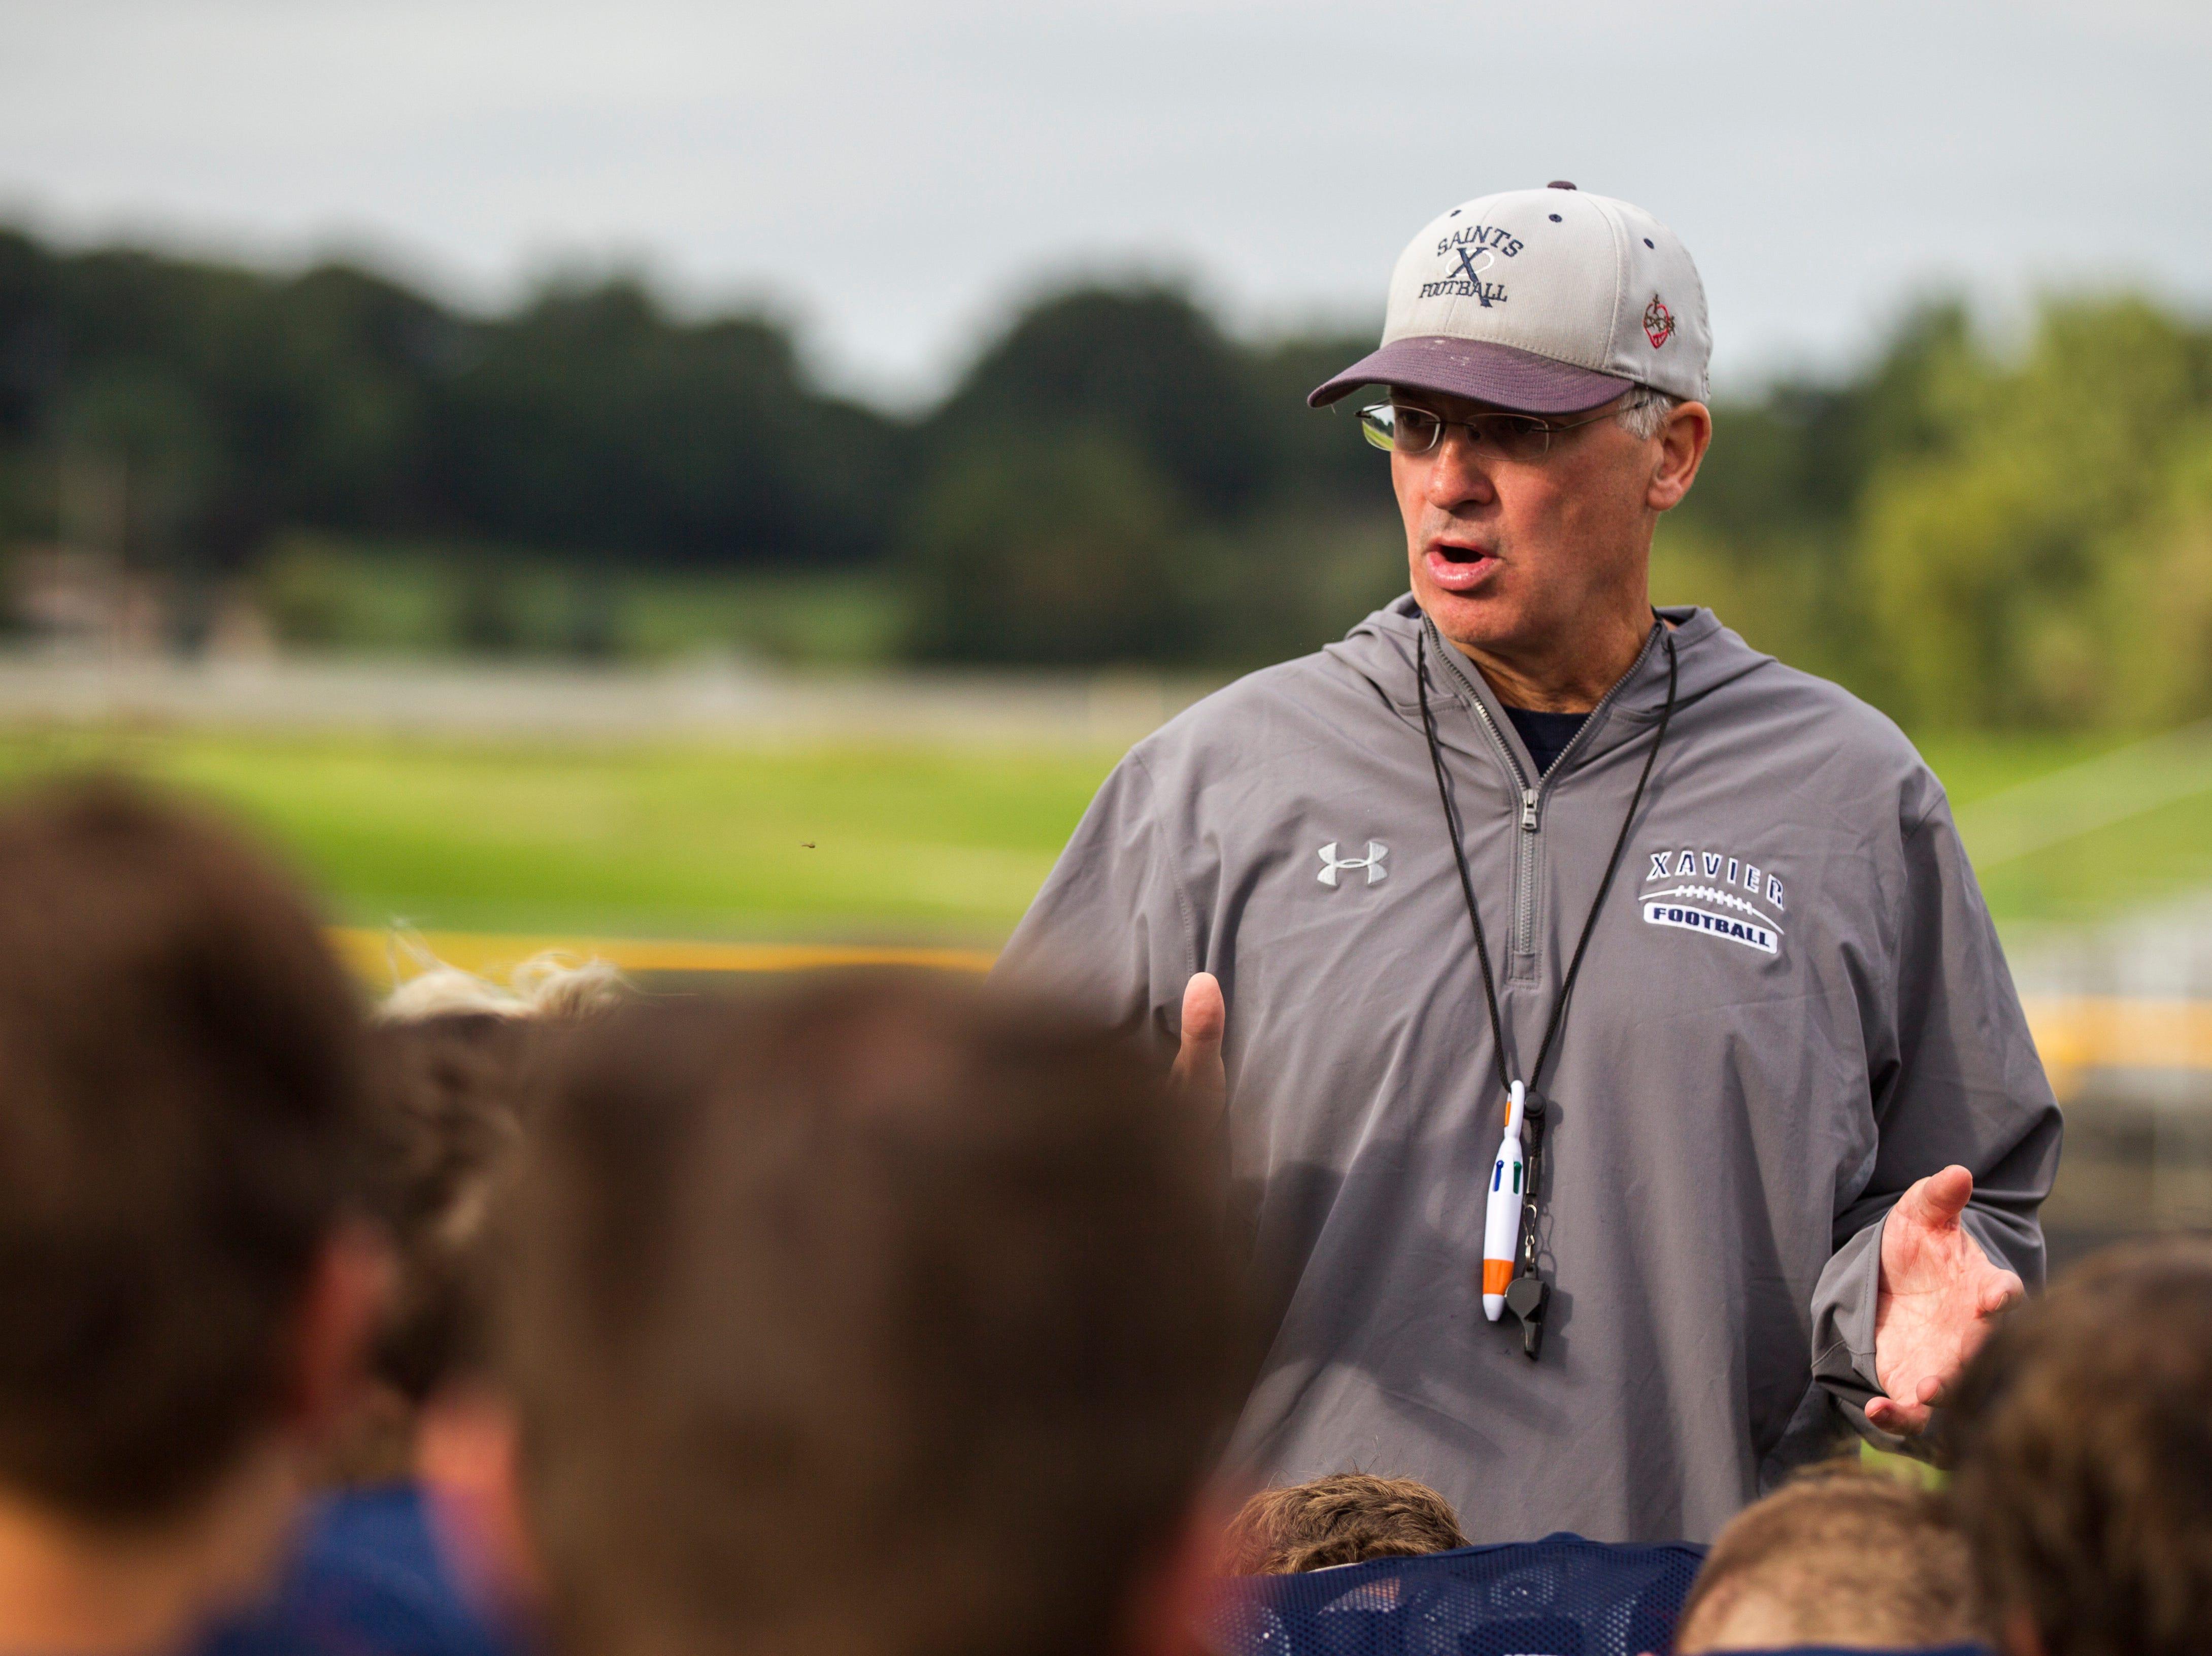 Cedar Rapids Xavier football head coach Duane Schulte talks with players after a varsity football practice on Thursday, Sept. 6, 2018, at Saints Field in Cedar Rapids.